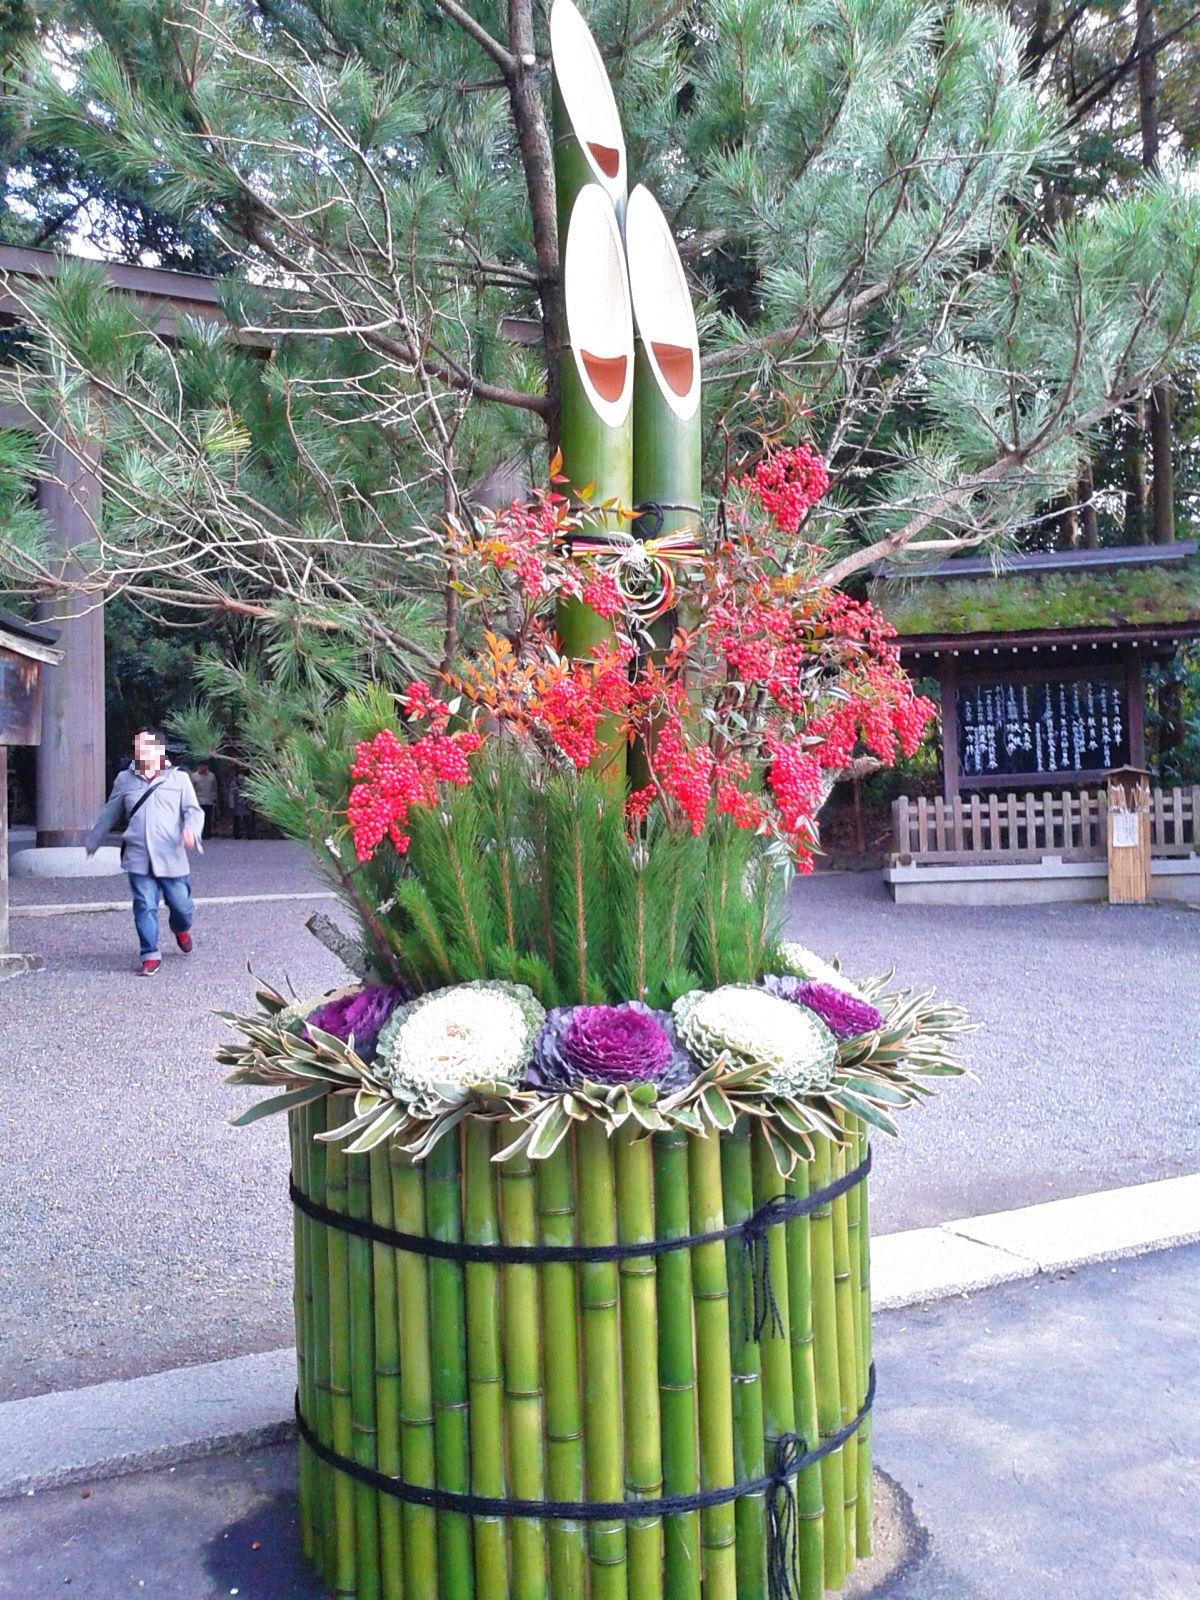 Omiwa shrine's kadomatsu